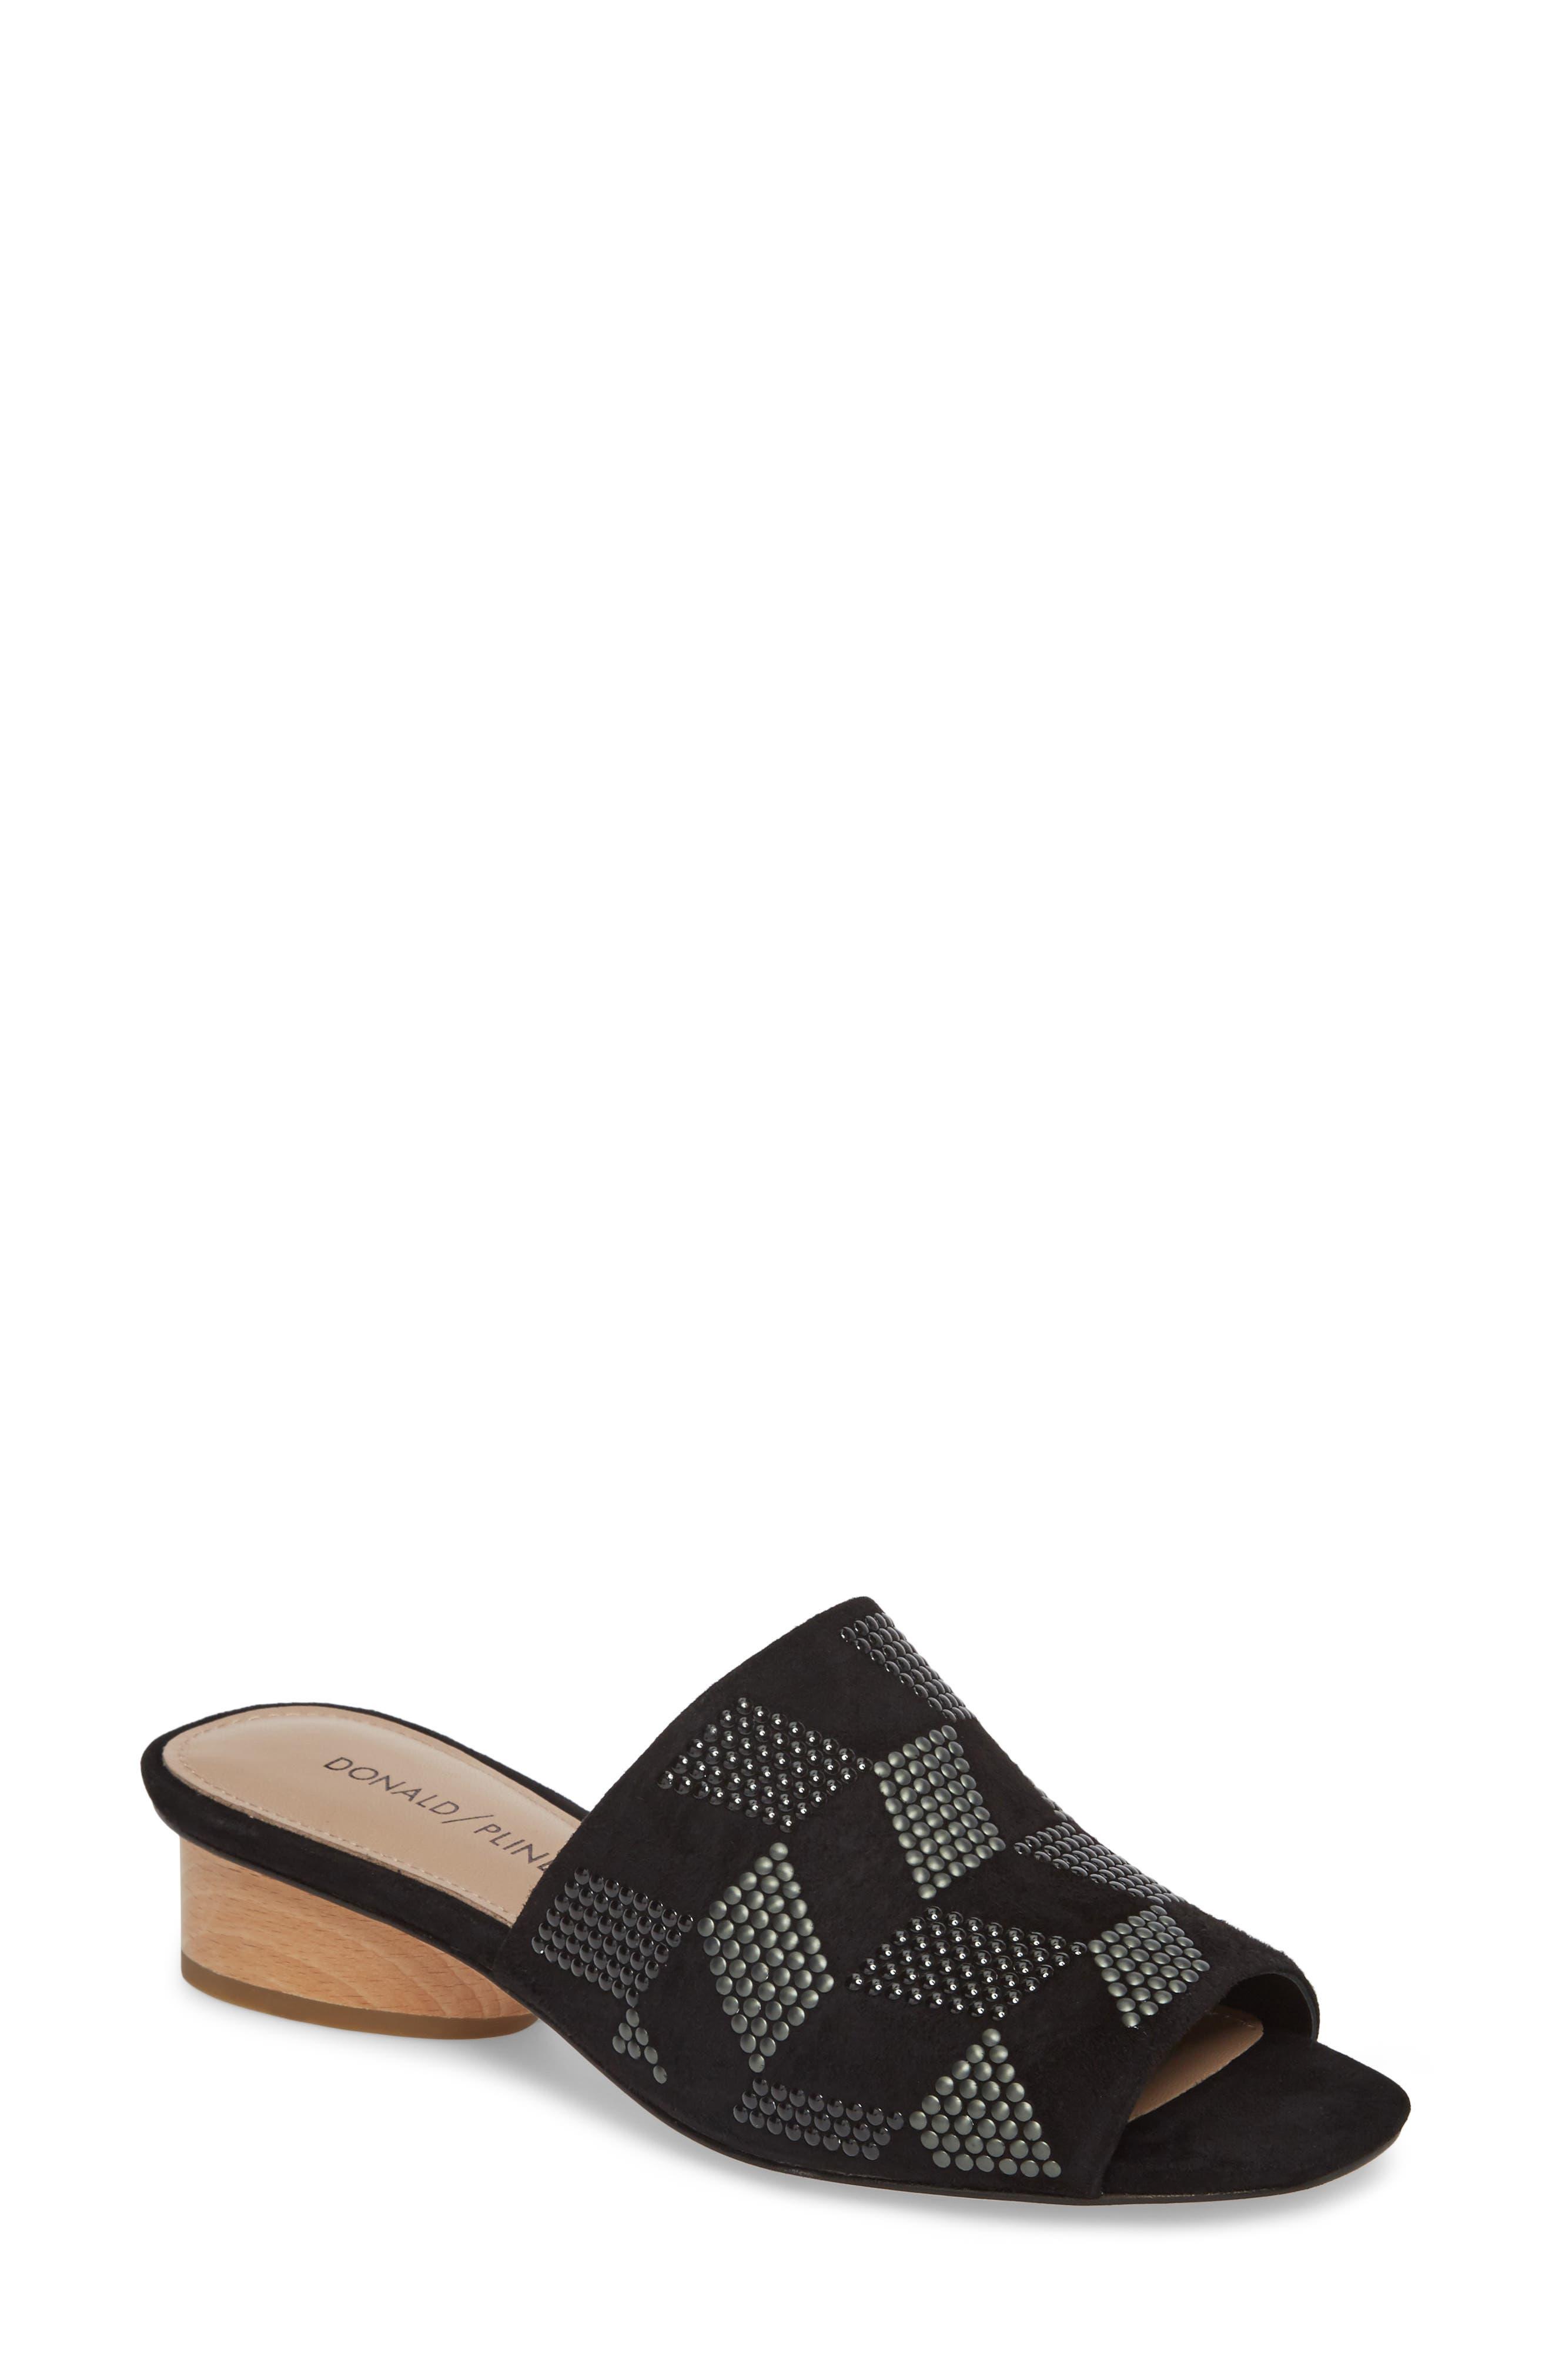 Rimini Slide Sandal,                             Main thumbnail 1, color,                             Black Suede